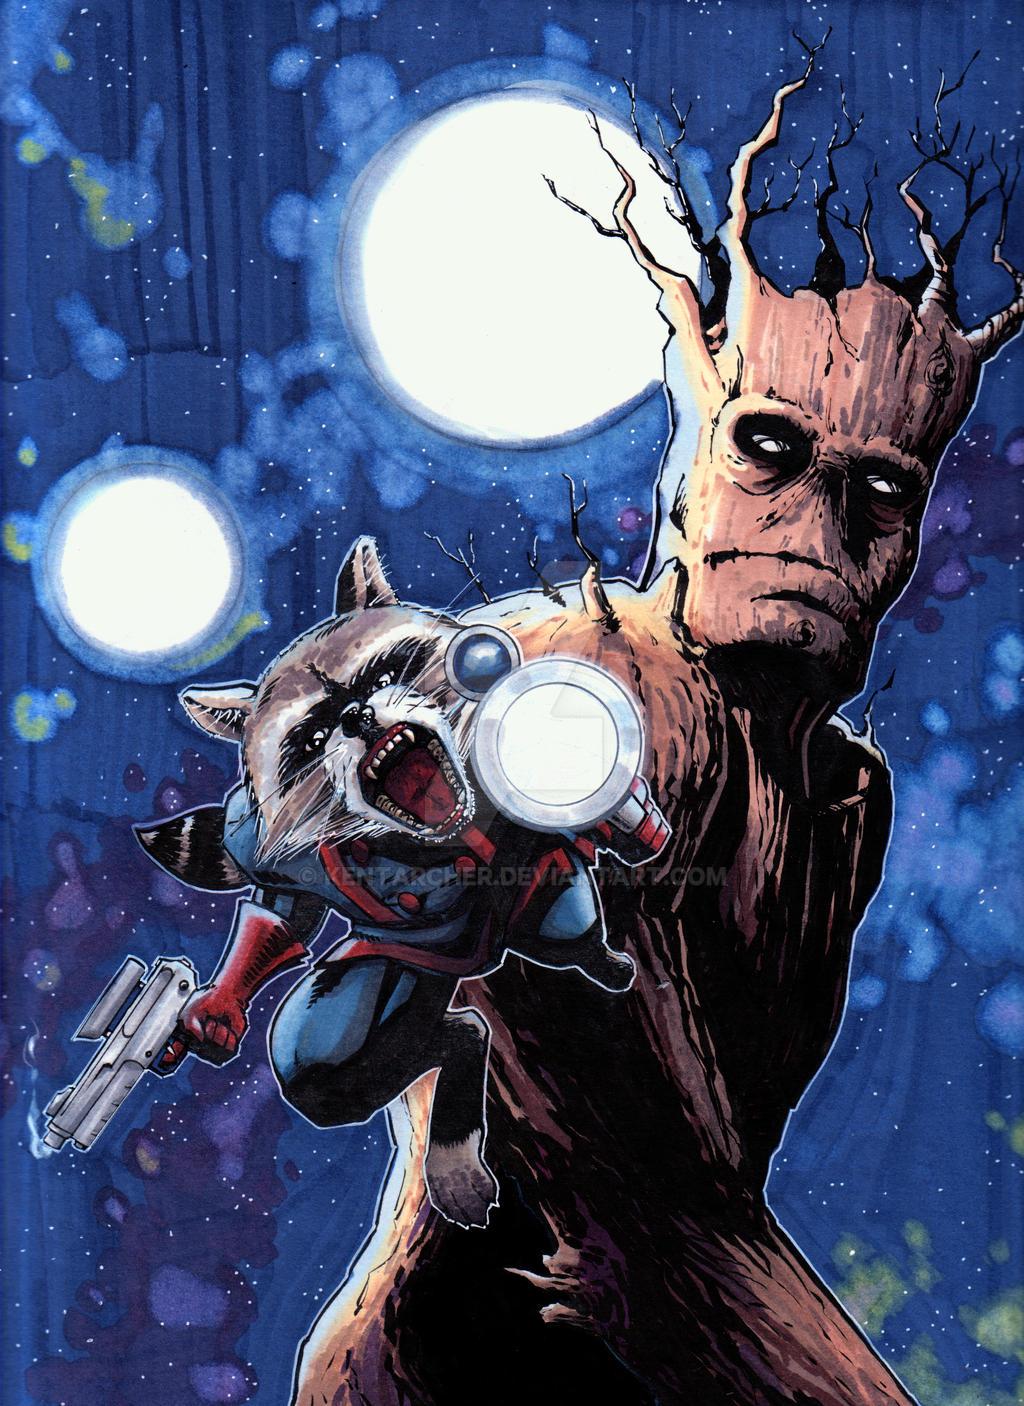 Groot and Rocket Raccoon by kentarcher